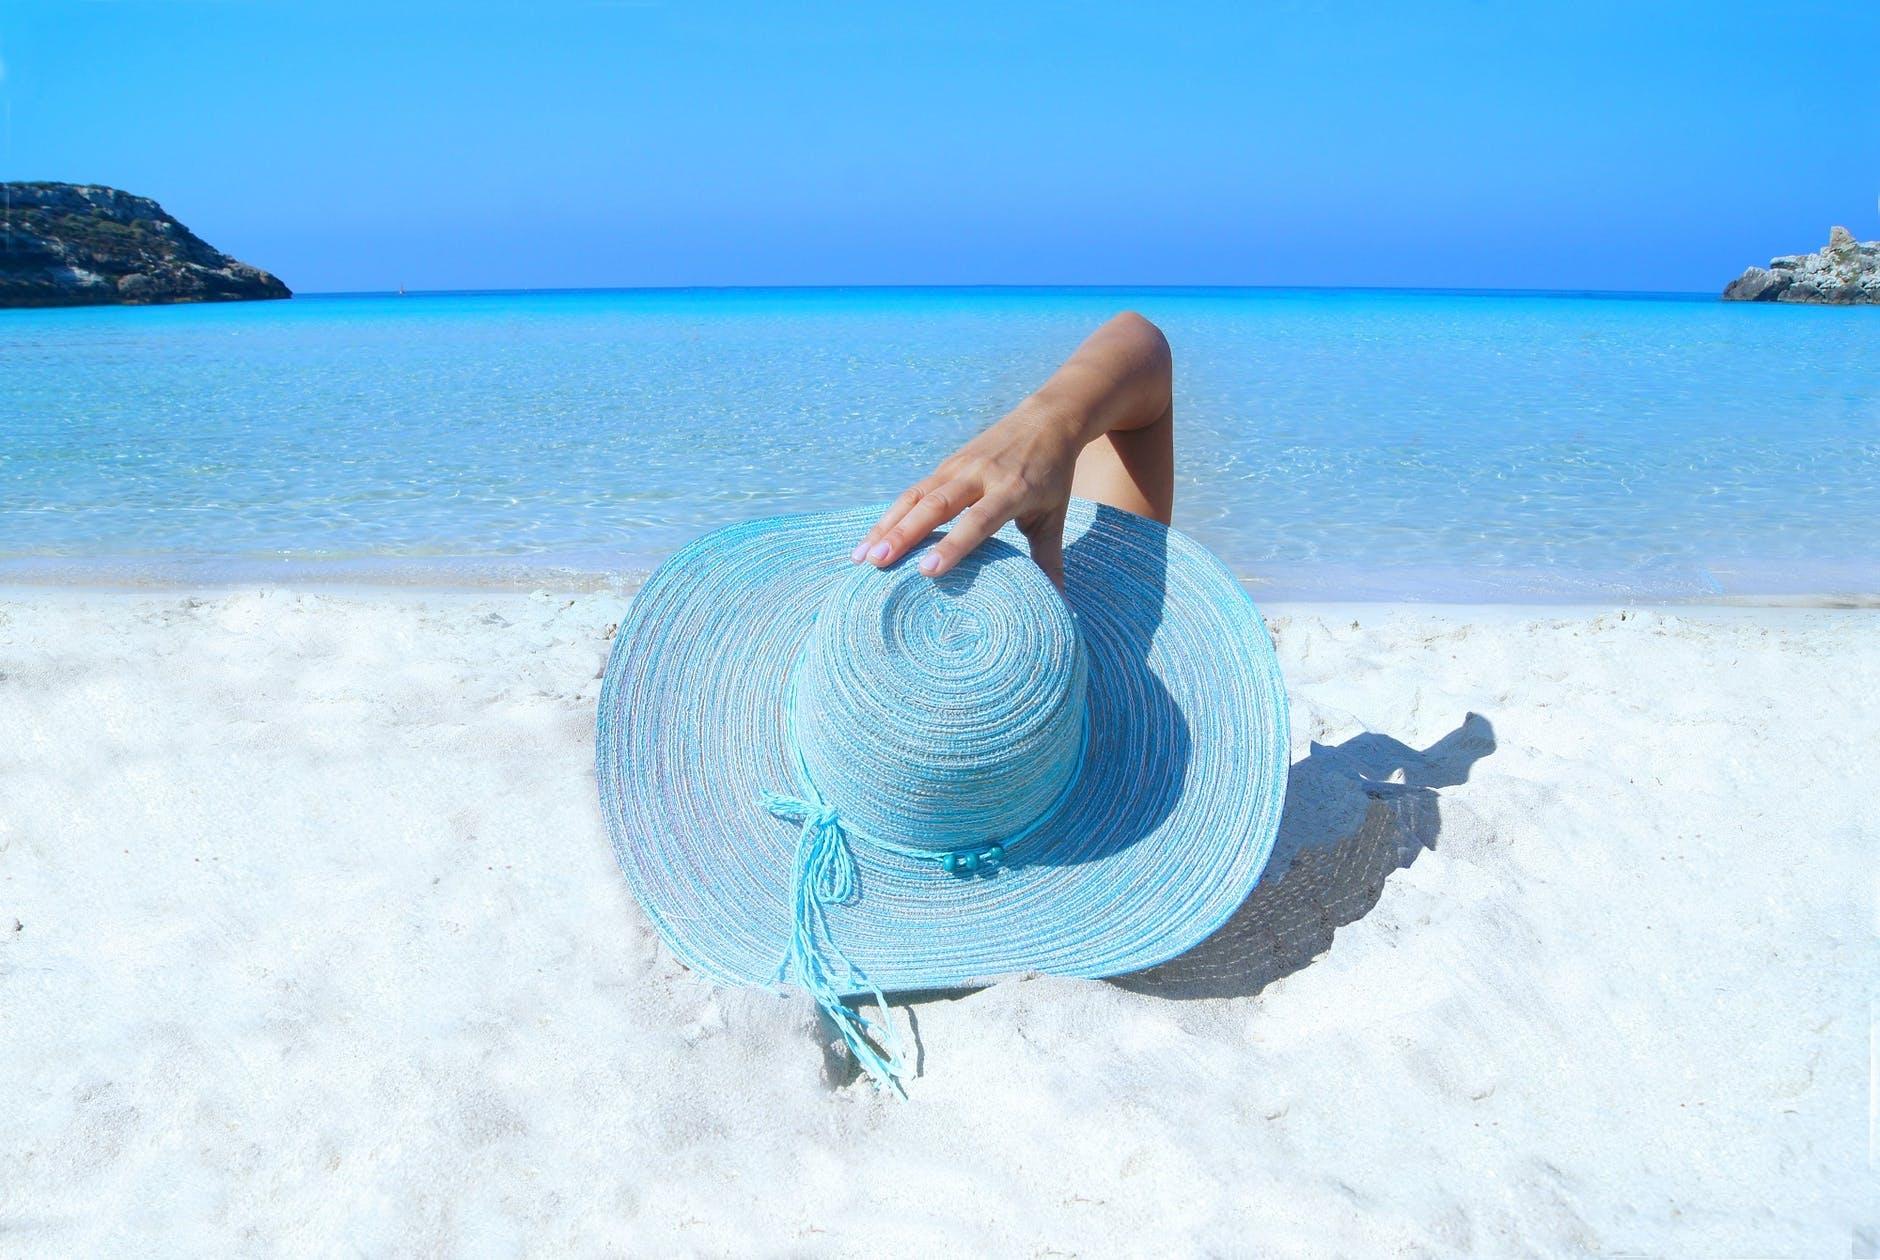 Sunbathing A Relaxing